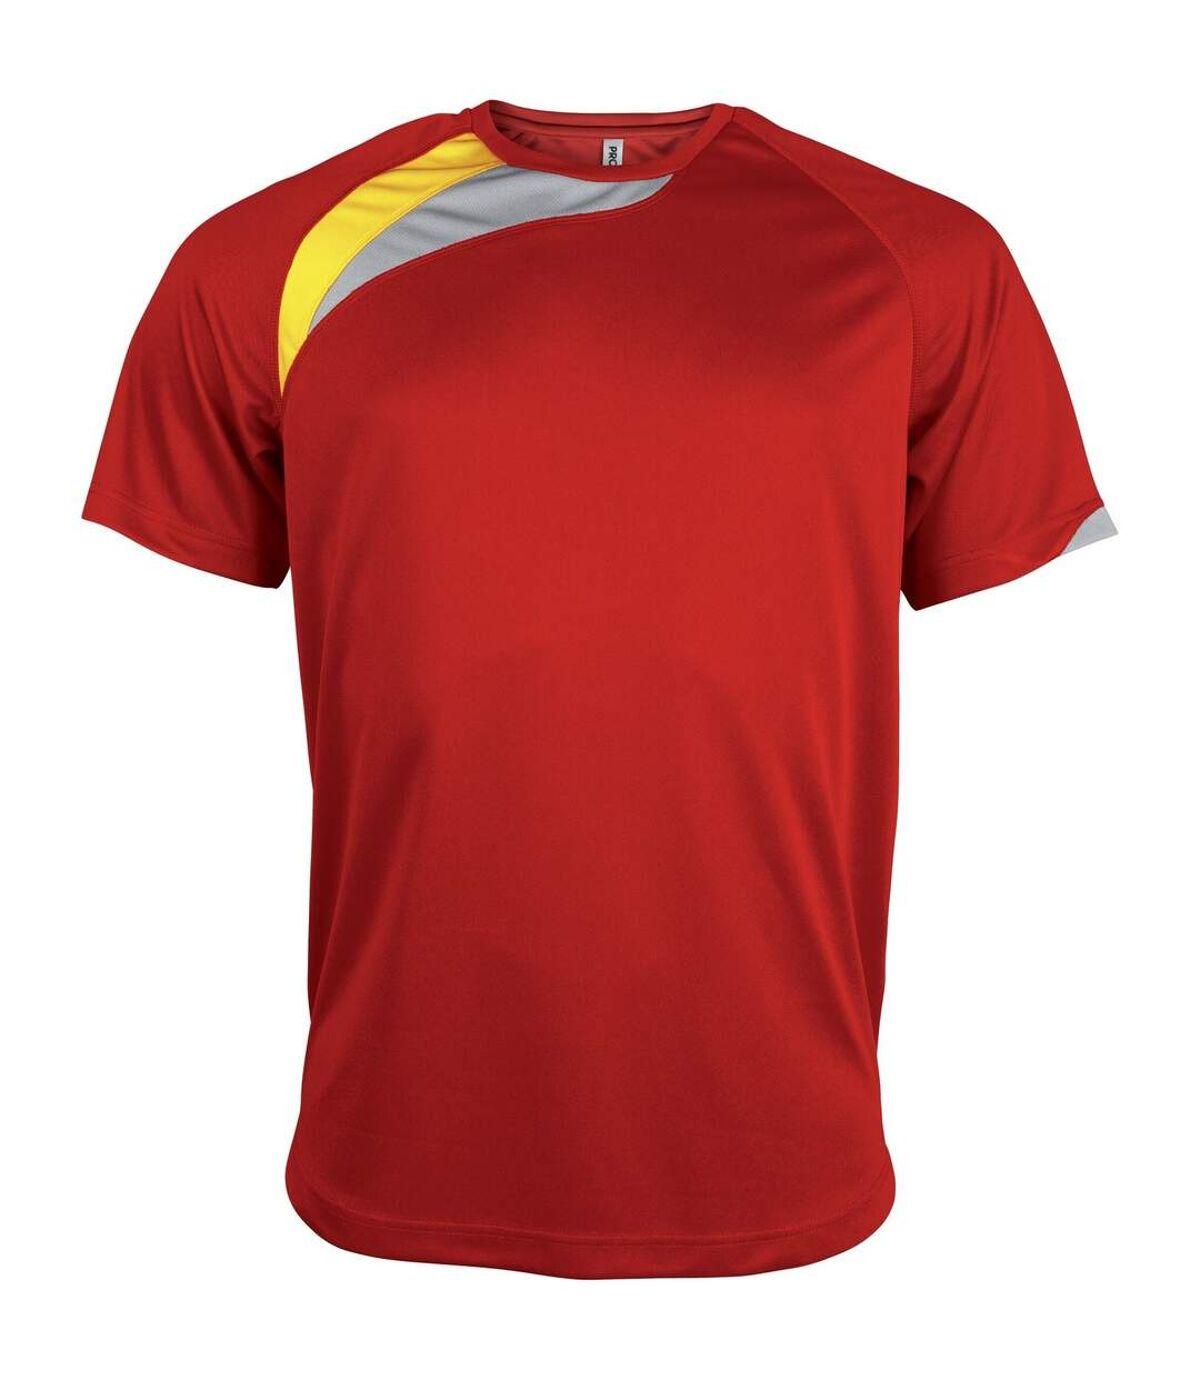 Kariban Proact Mens Short Sleeve Crew Neck Sports T-Shirt (Royal Blue/ White/ Storm Grey) - UTRW4243